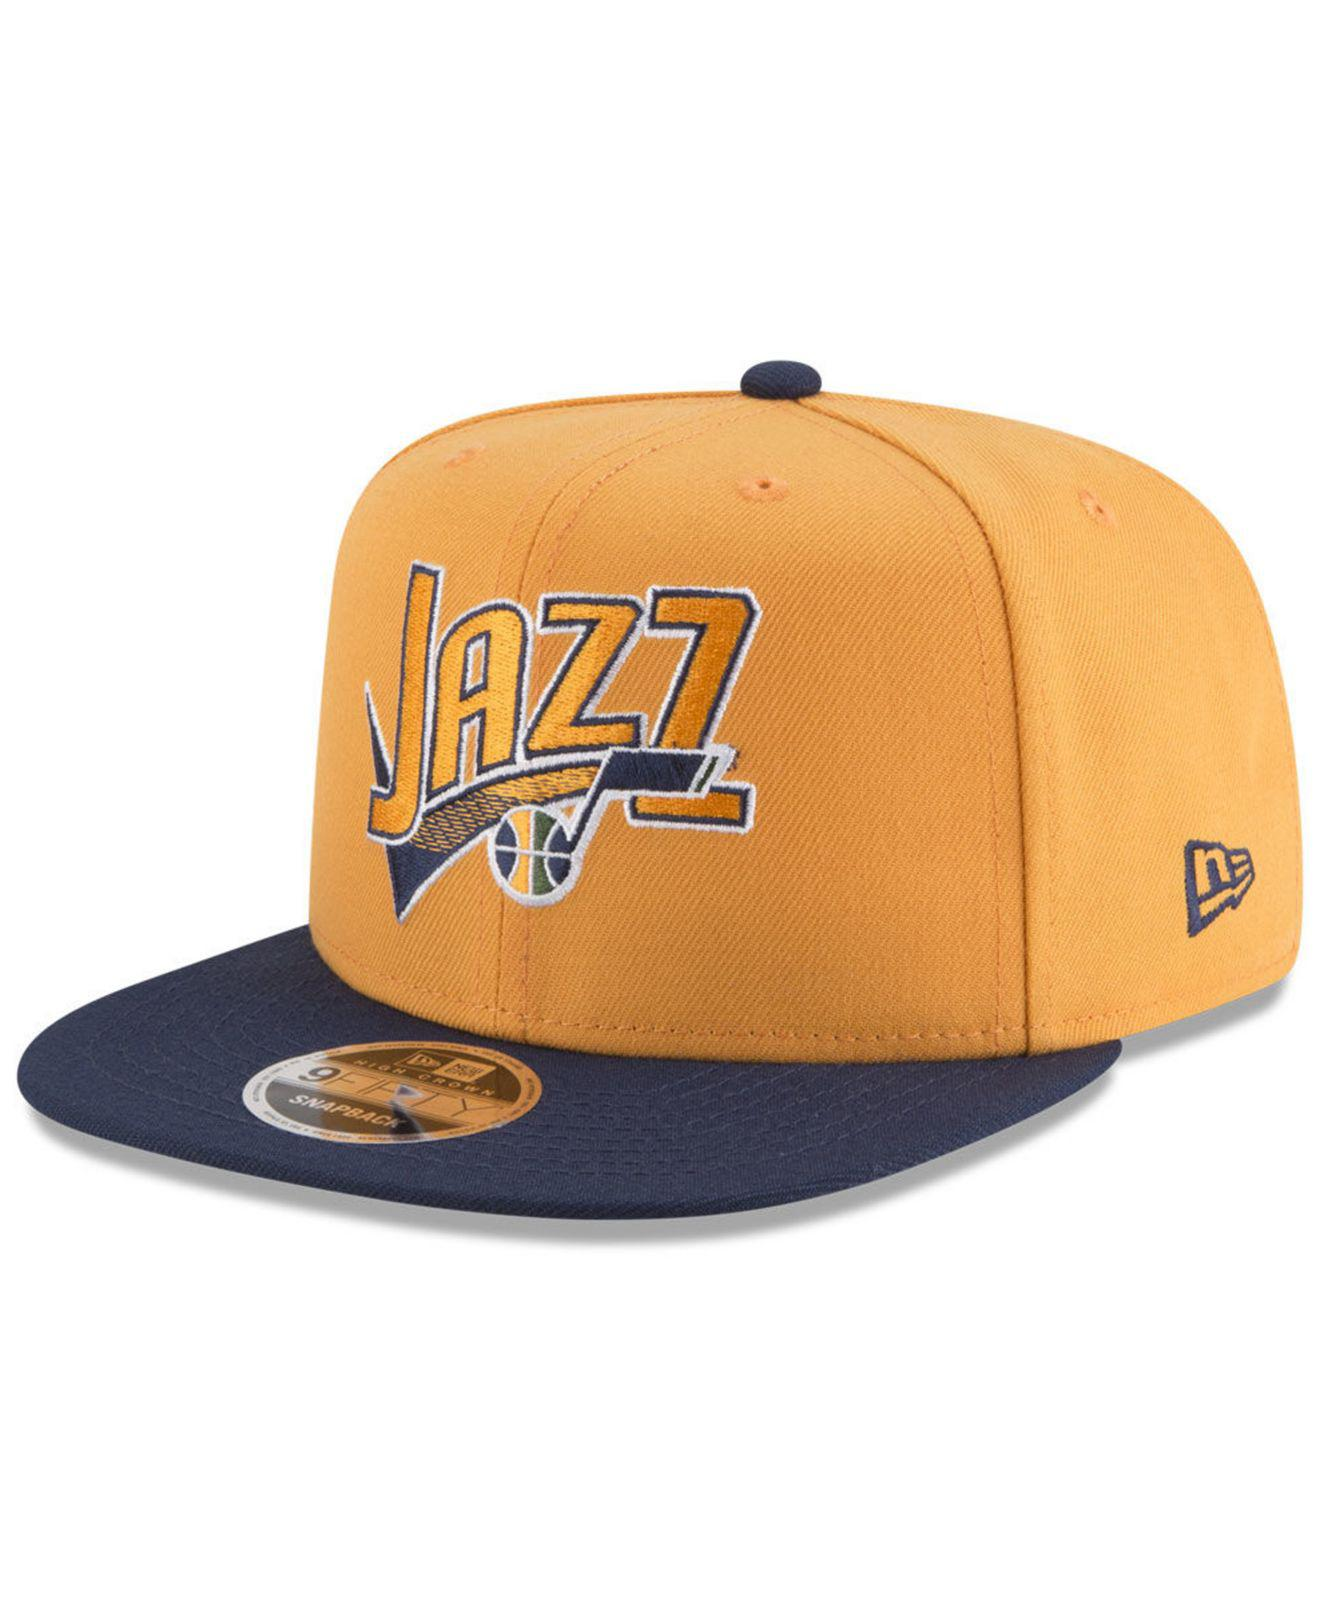 Lyst - KTZ Utah Jazz Retro Tail 9fifty Snapback Cap in Blue for Men 4b106c82e